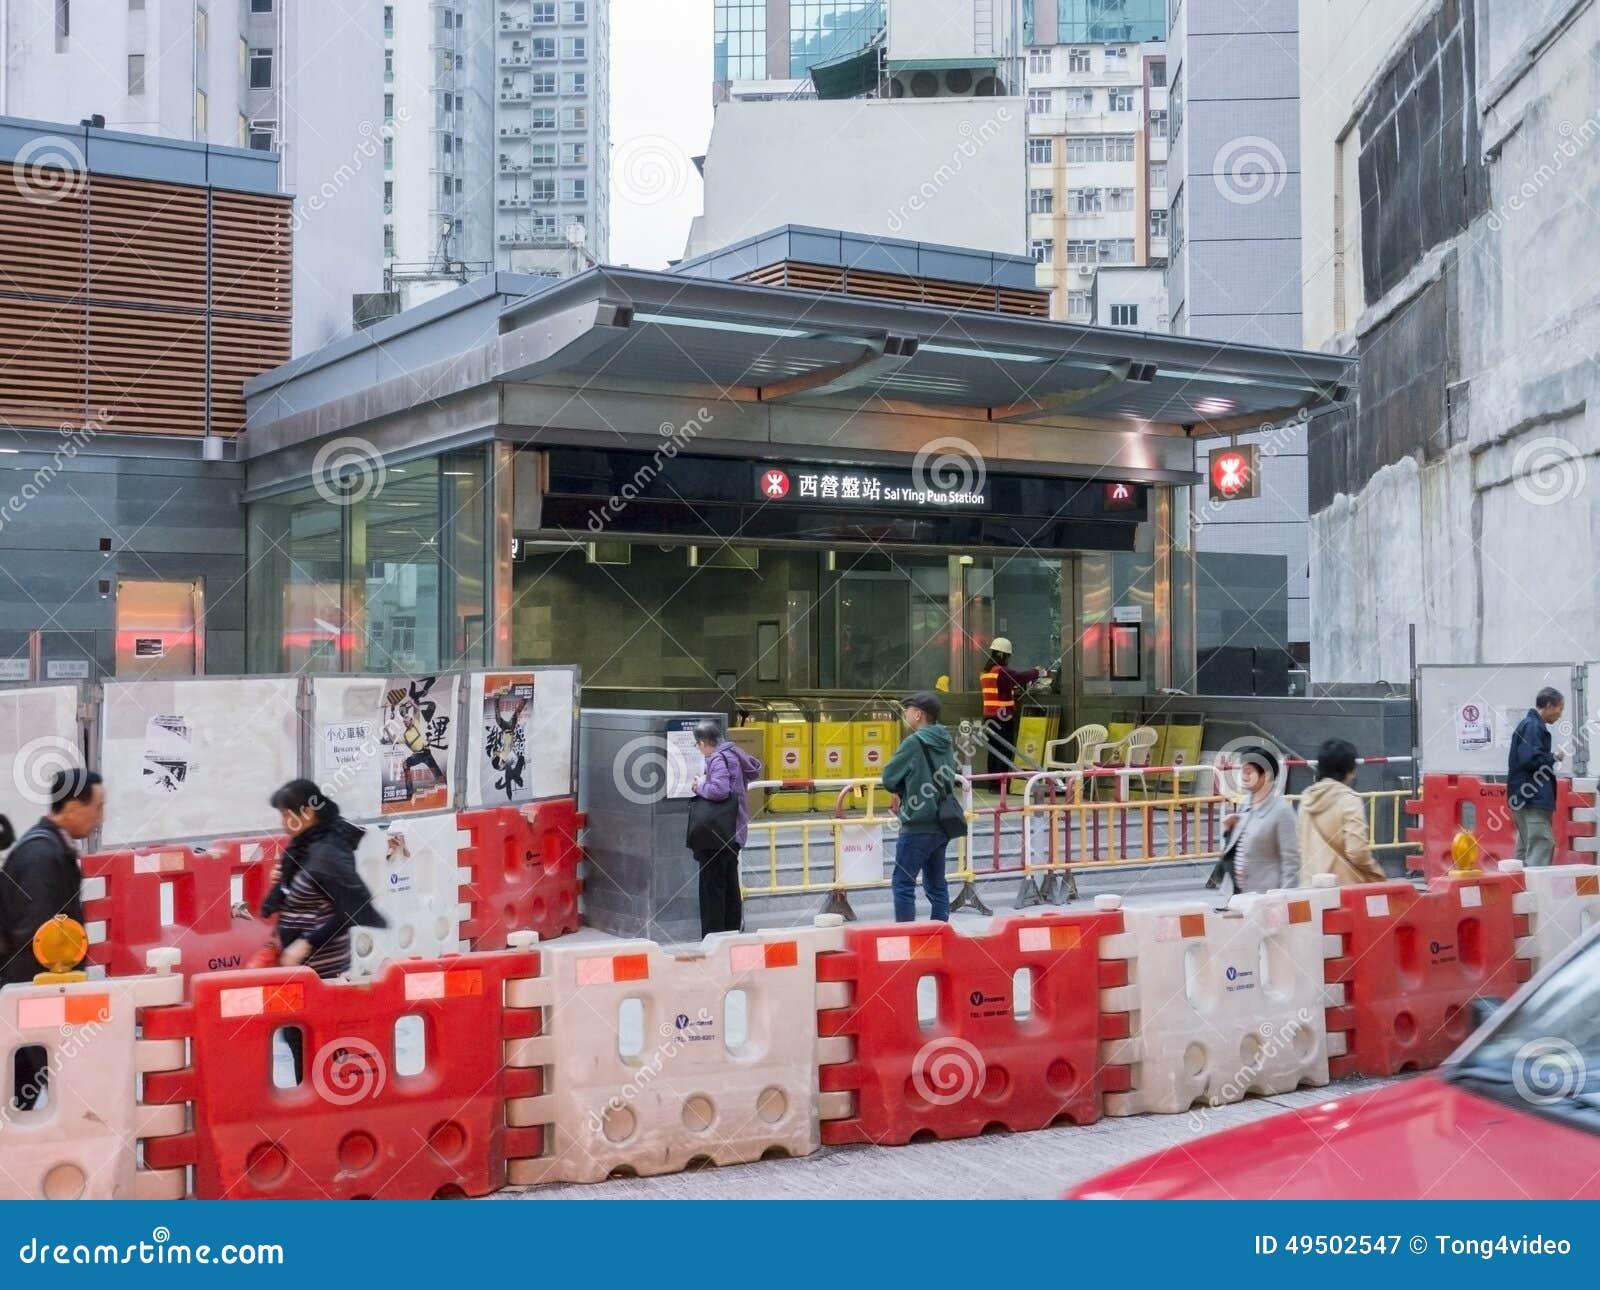 csr of hong kong mtr service Mainland manufacturer for mtr secretly recalls 35 trains hong kong's mtr corporation has made many hong kong free press is a non-profit english language.